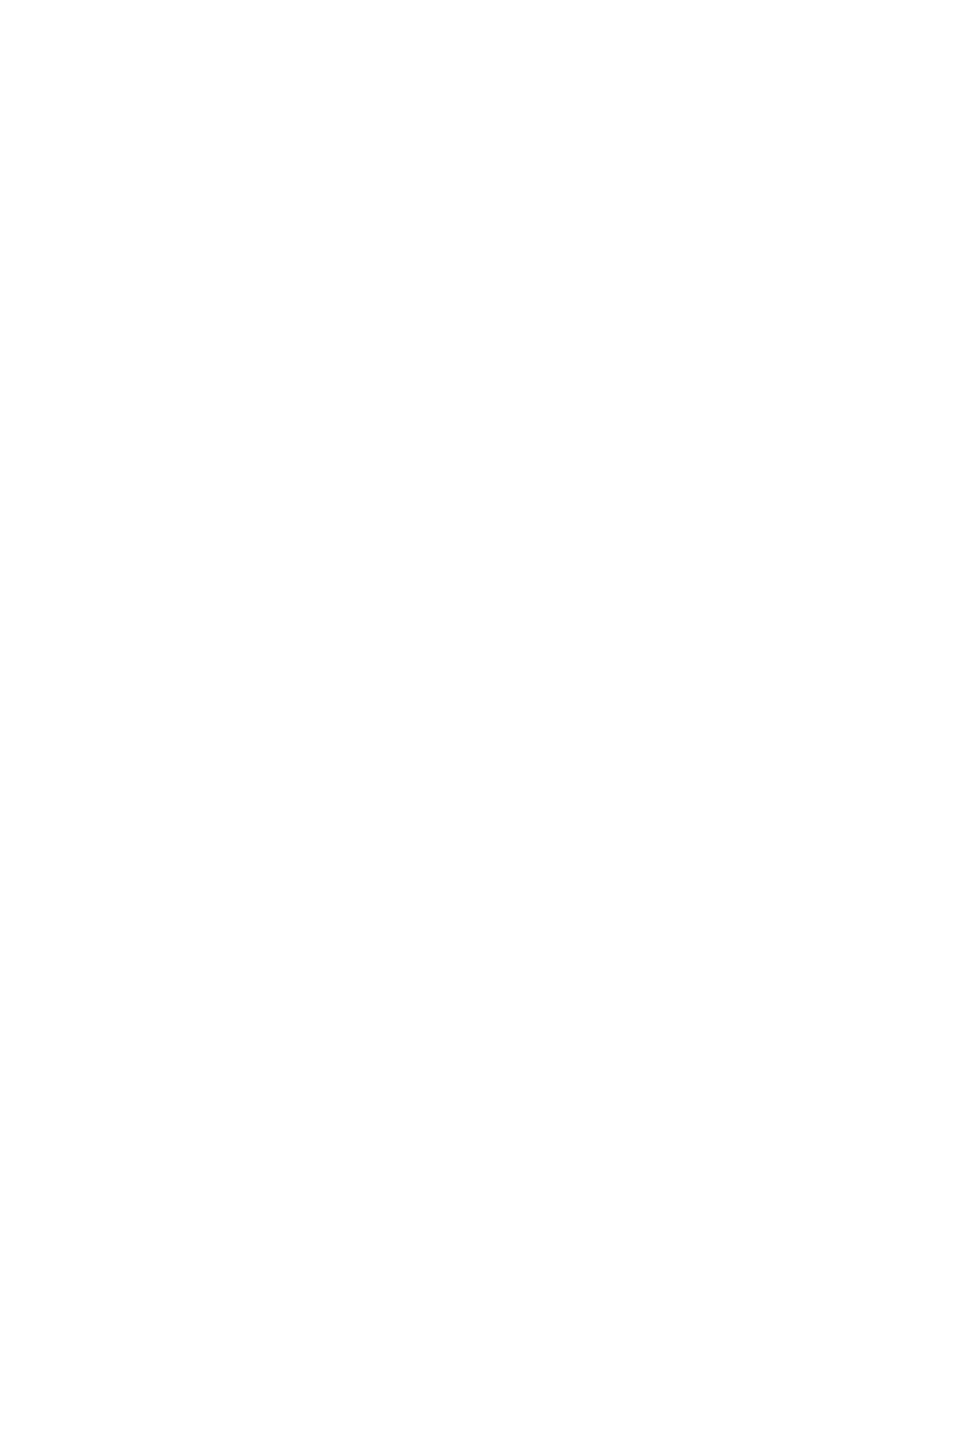 Maintenance, Spark plugs   Polaris Sportsman 850 XP EPS User